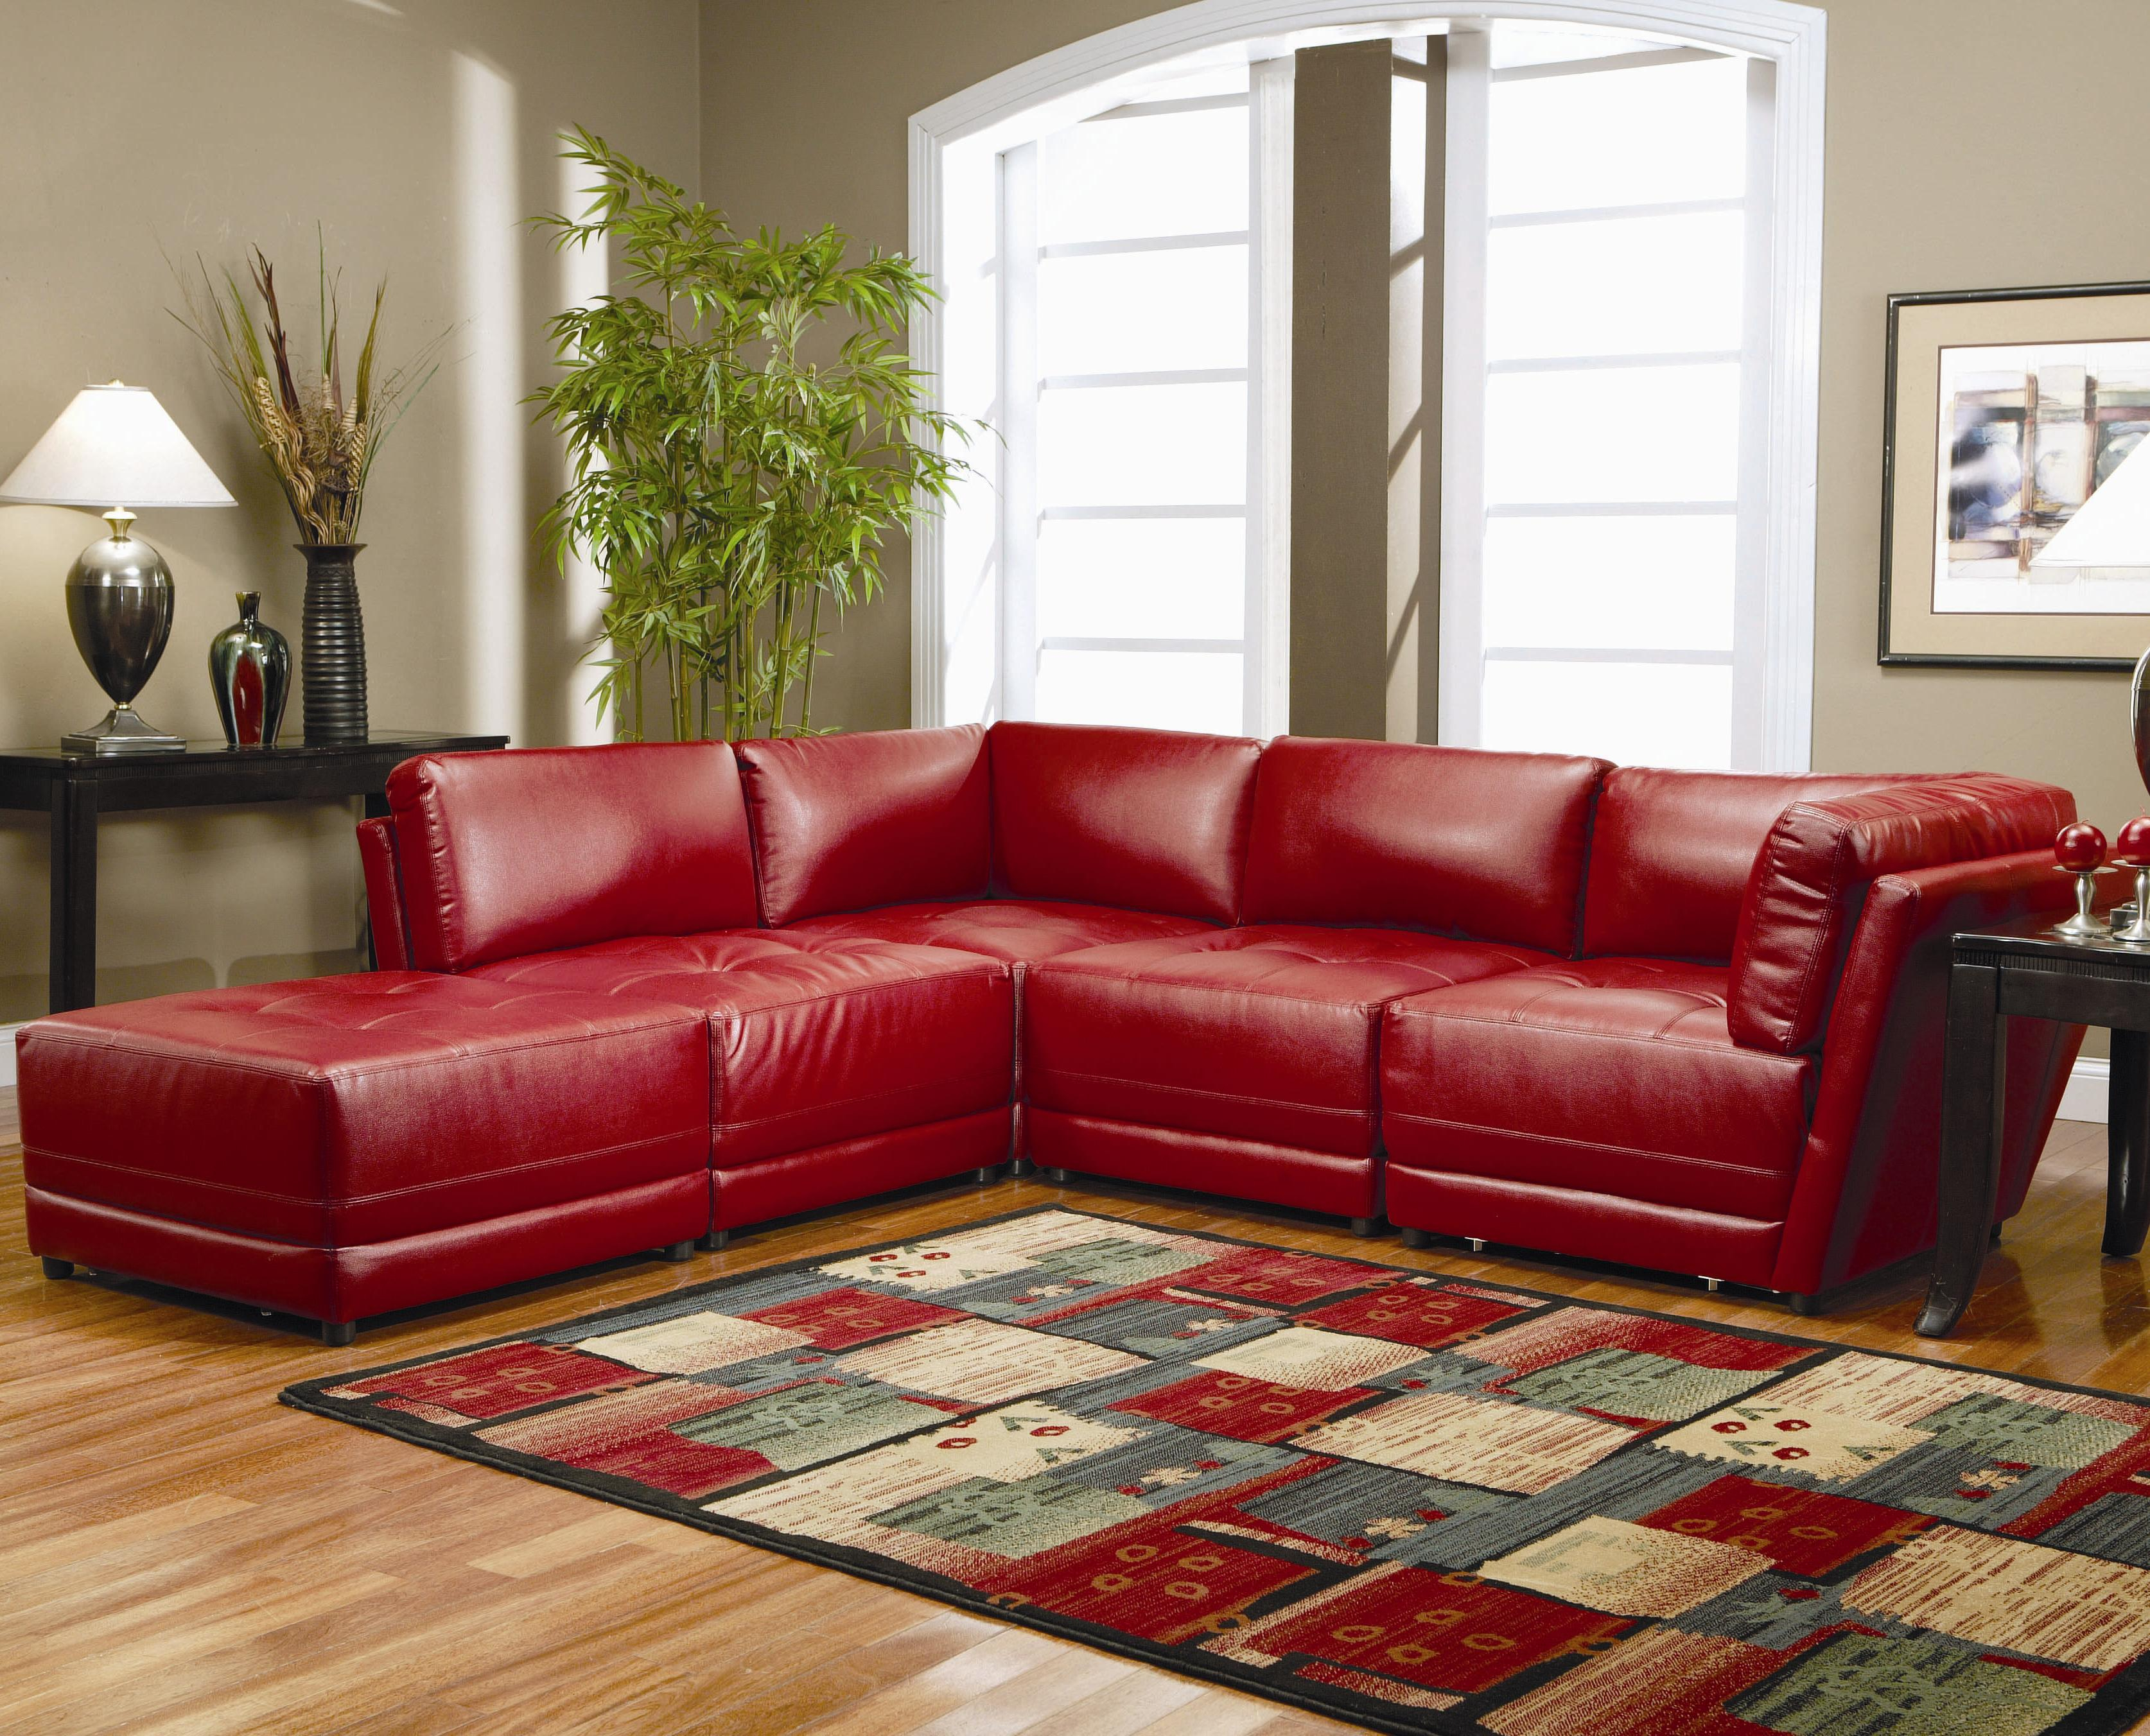 Sofa Natuzzi Precious Home Design within measurements 3348 X 2704